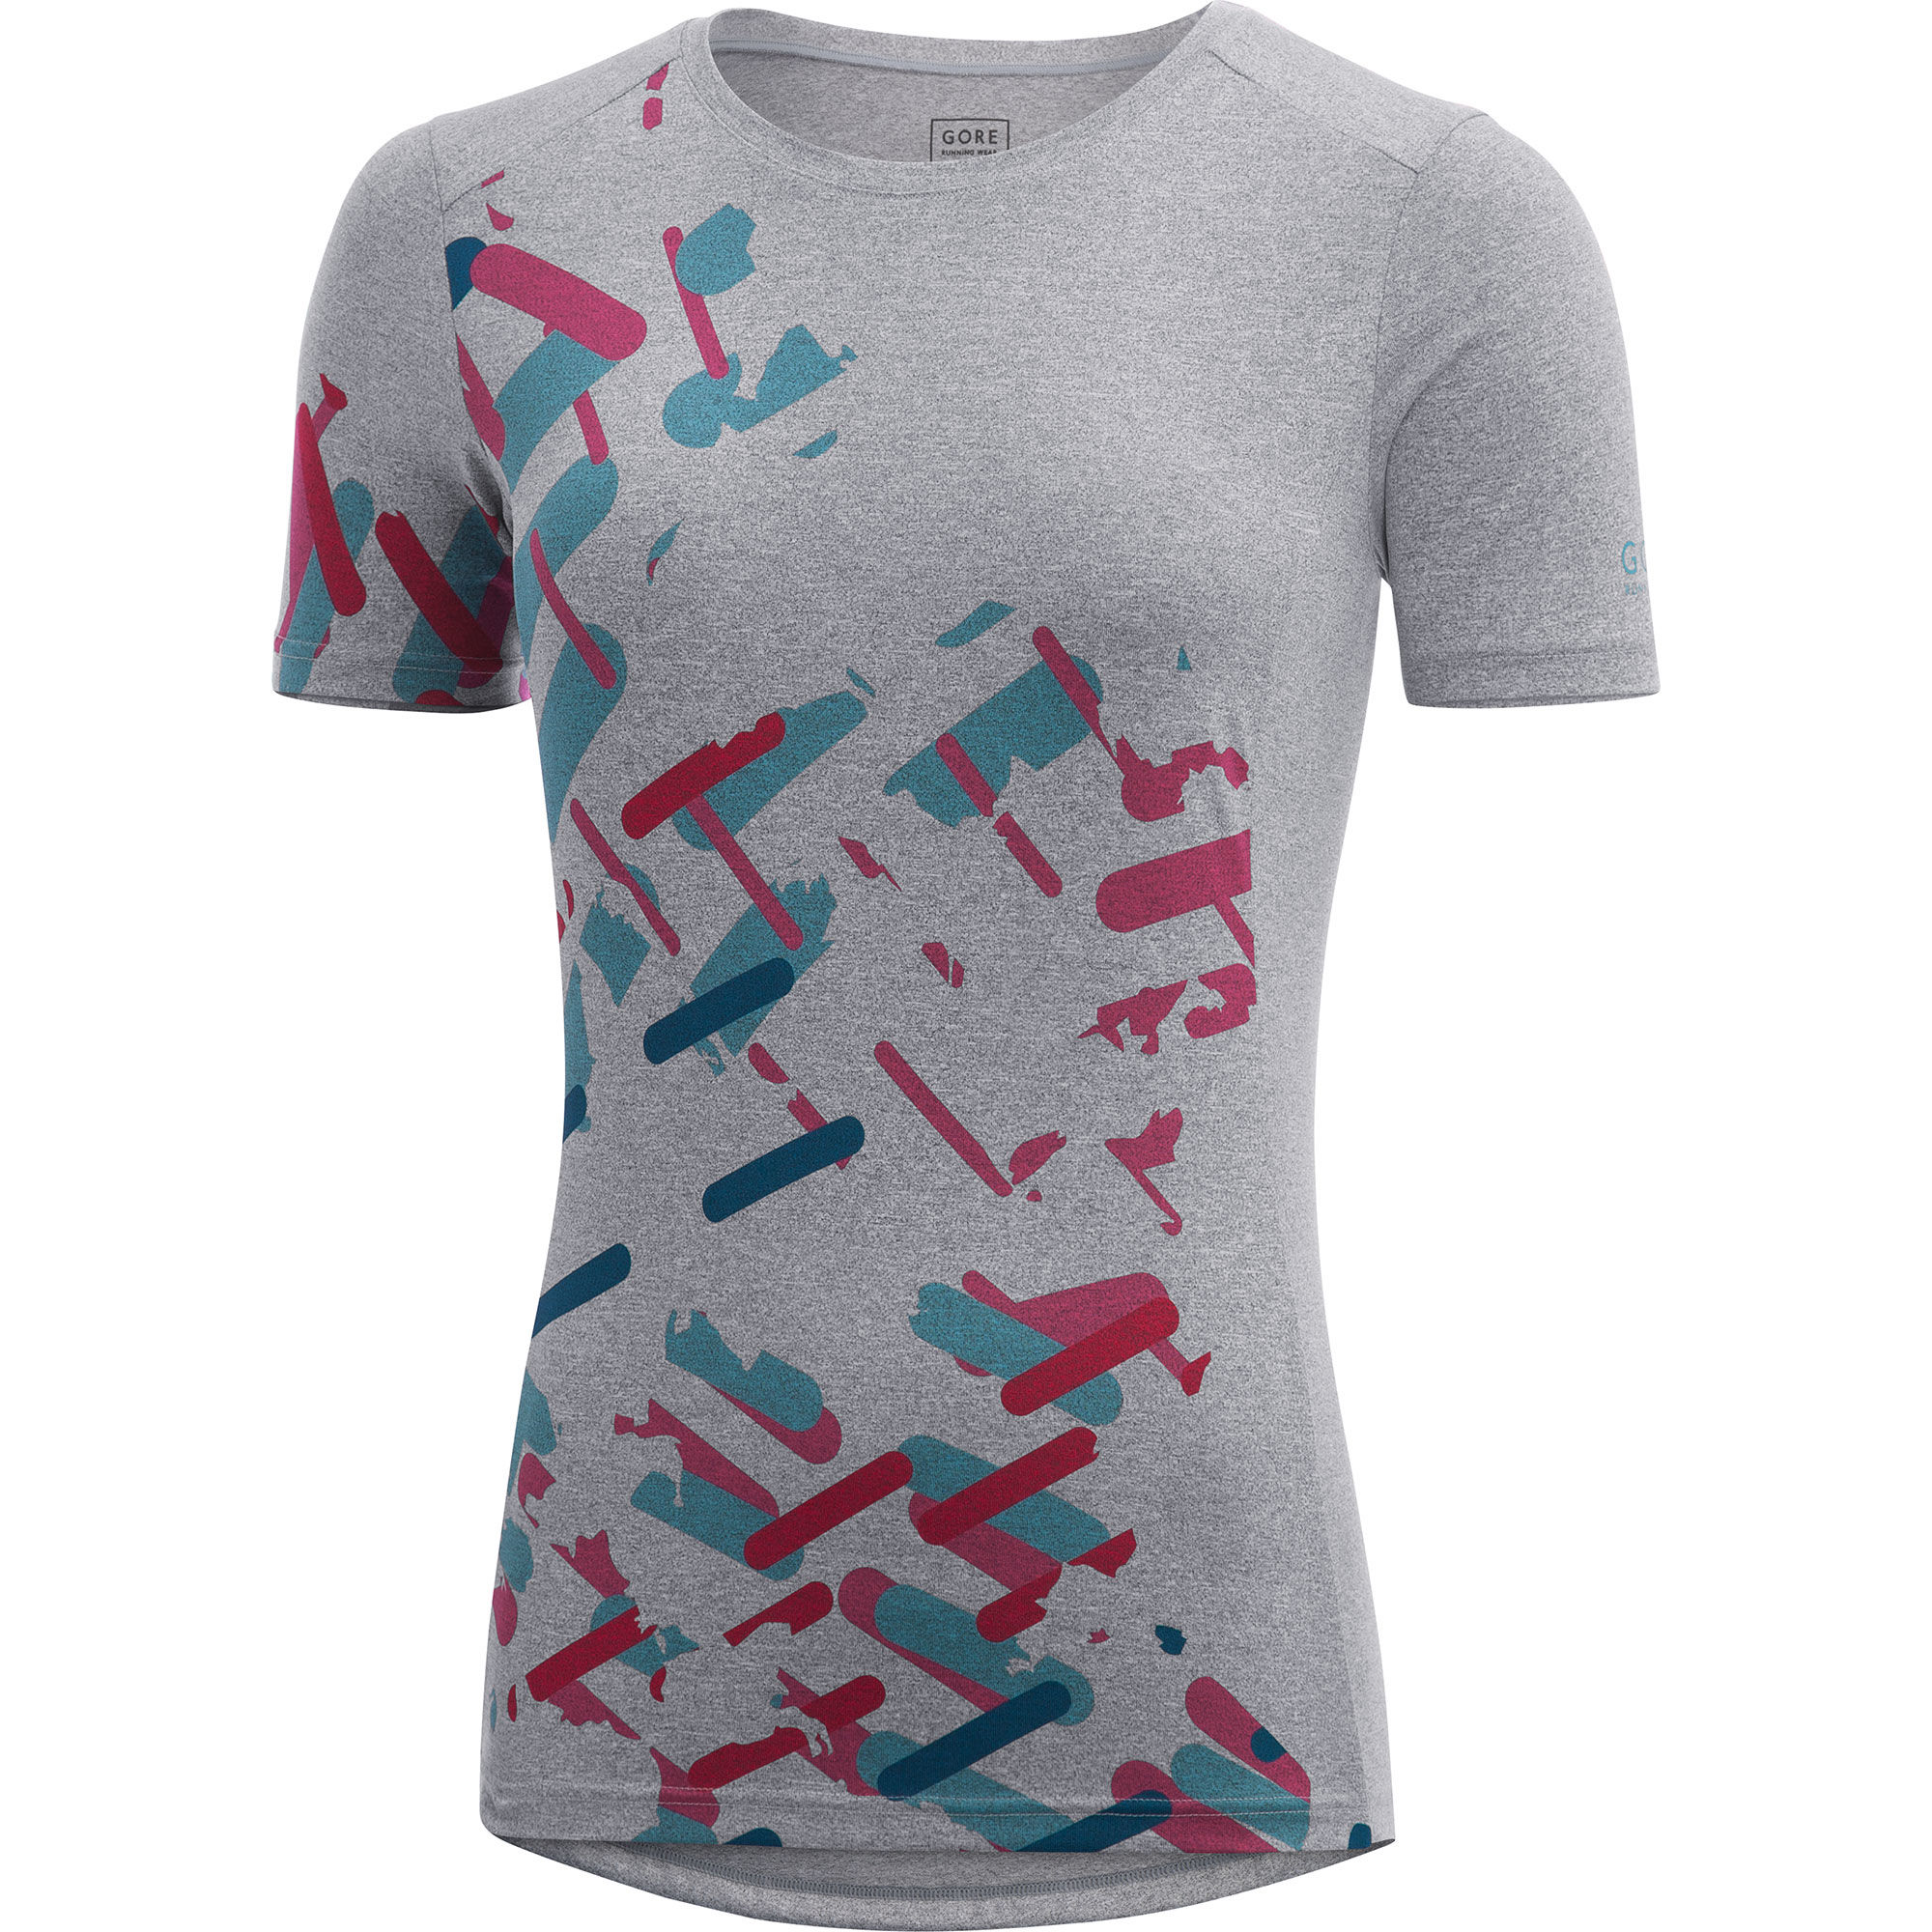 Gore Essential Lady Print Shirt in Grau